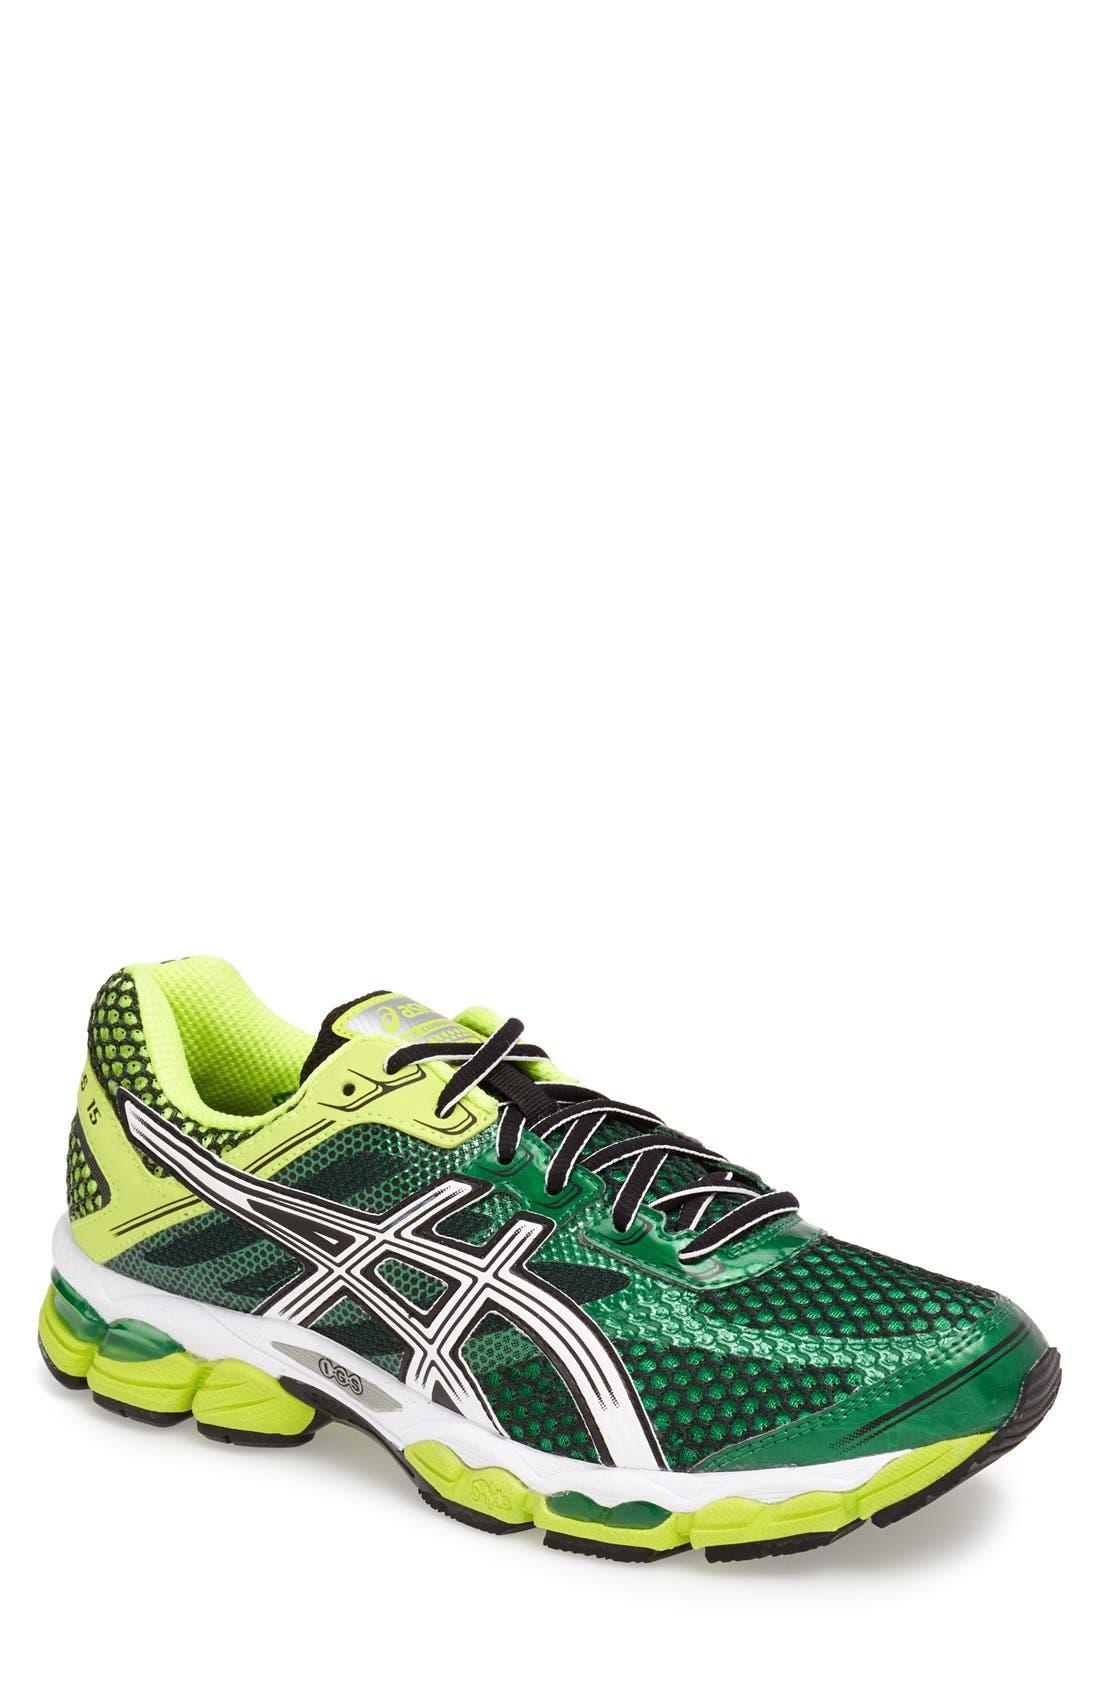 Main Image - ASICS® 'GEL-Cumulous 15' Running Shoe (Men)